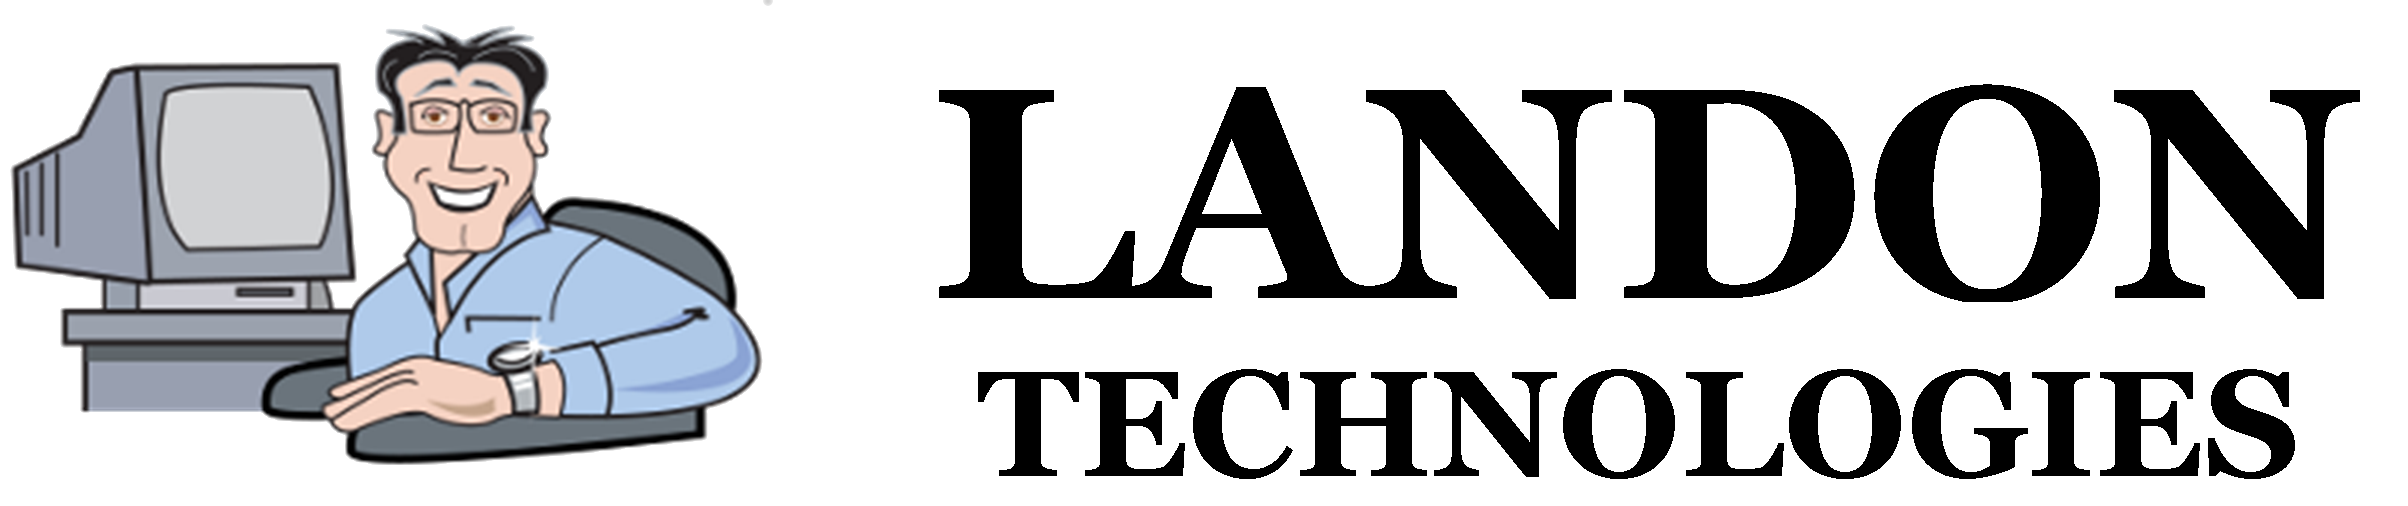 Landon Technologies